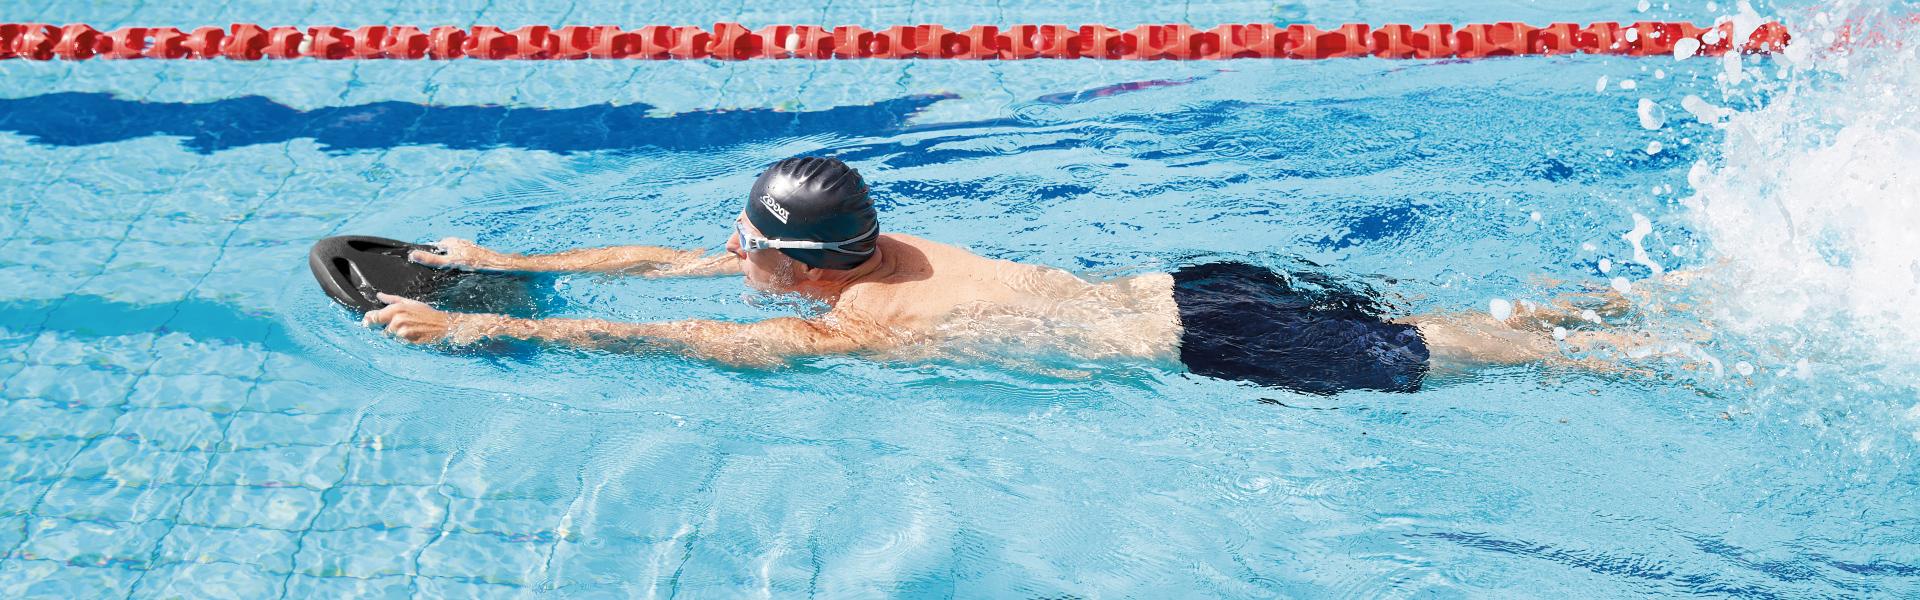 "Adam ""Ocean"" Walker: 7 Steps from Pool to Open Water"